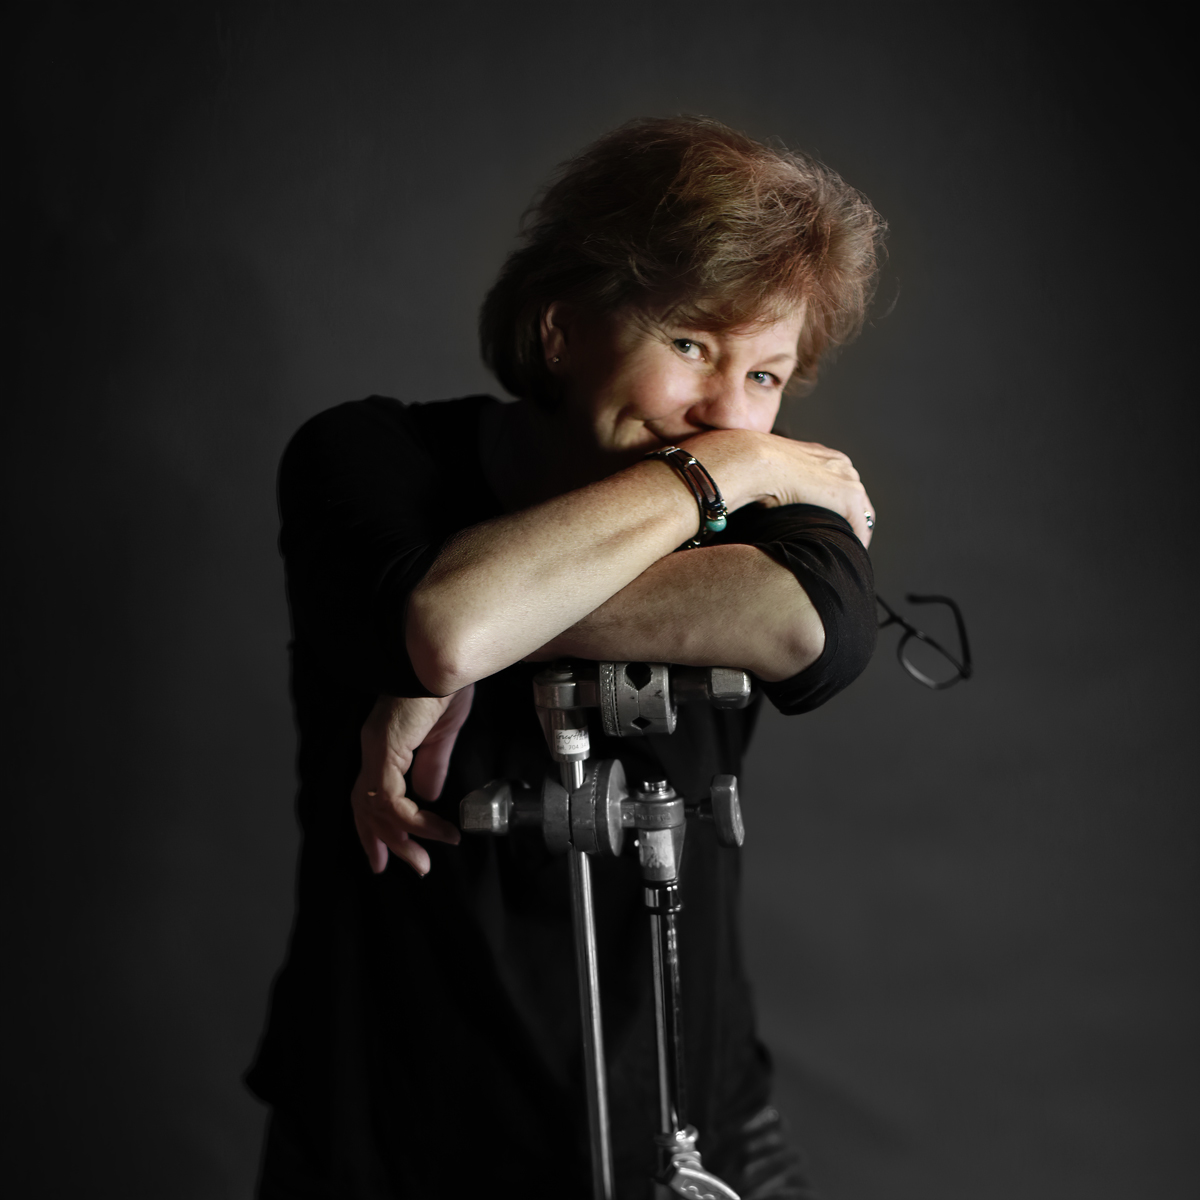 Joanne Hock, Joanne Hock Films, Female Directors, Independent Filmmaker, Female Filmmakers